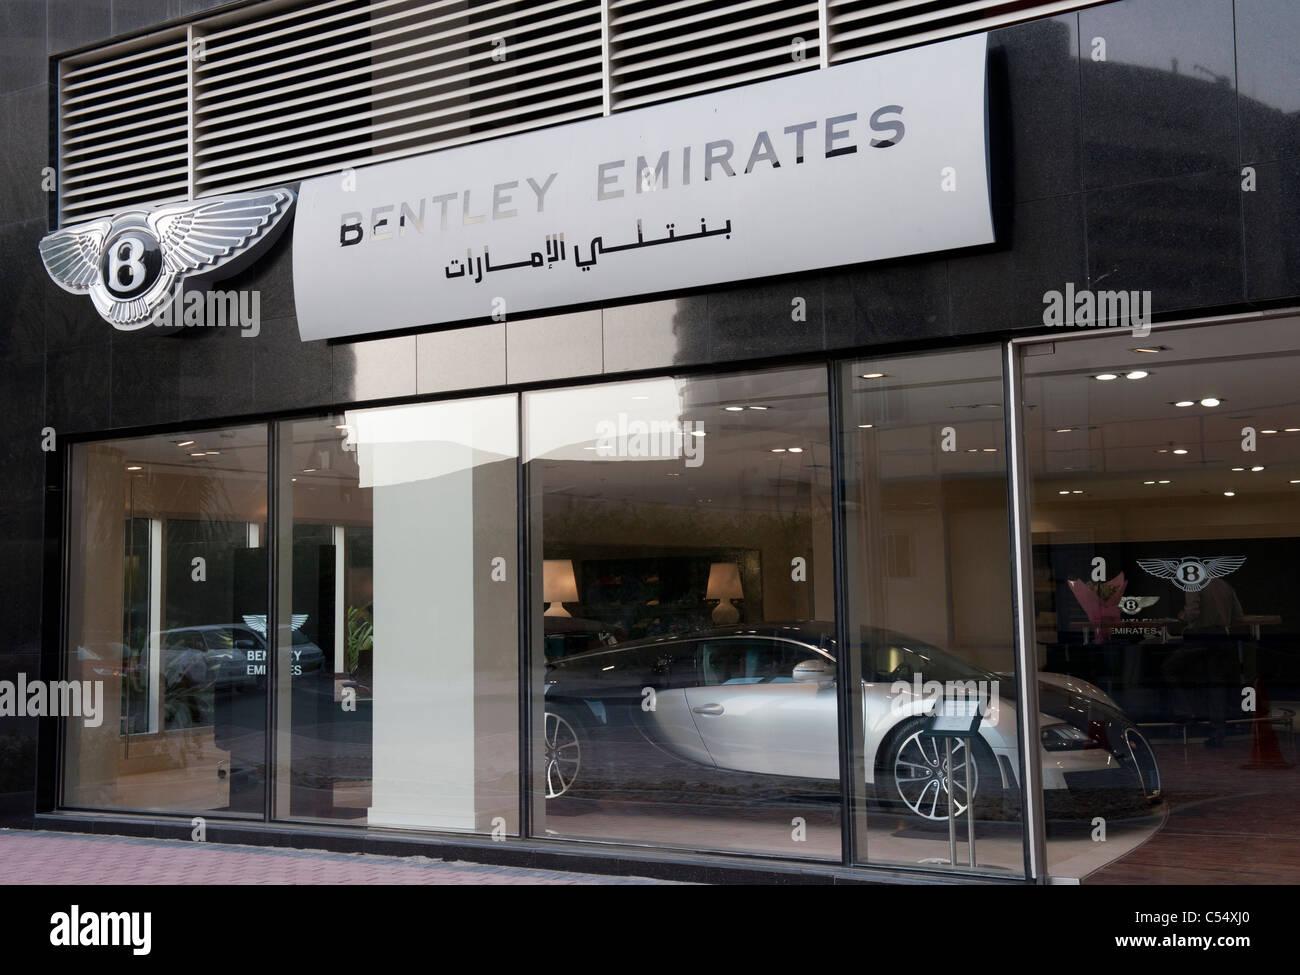 Bentley-Auto-Showroom in Dubai Vereinigte Arabische Emirate VAE Stockbild